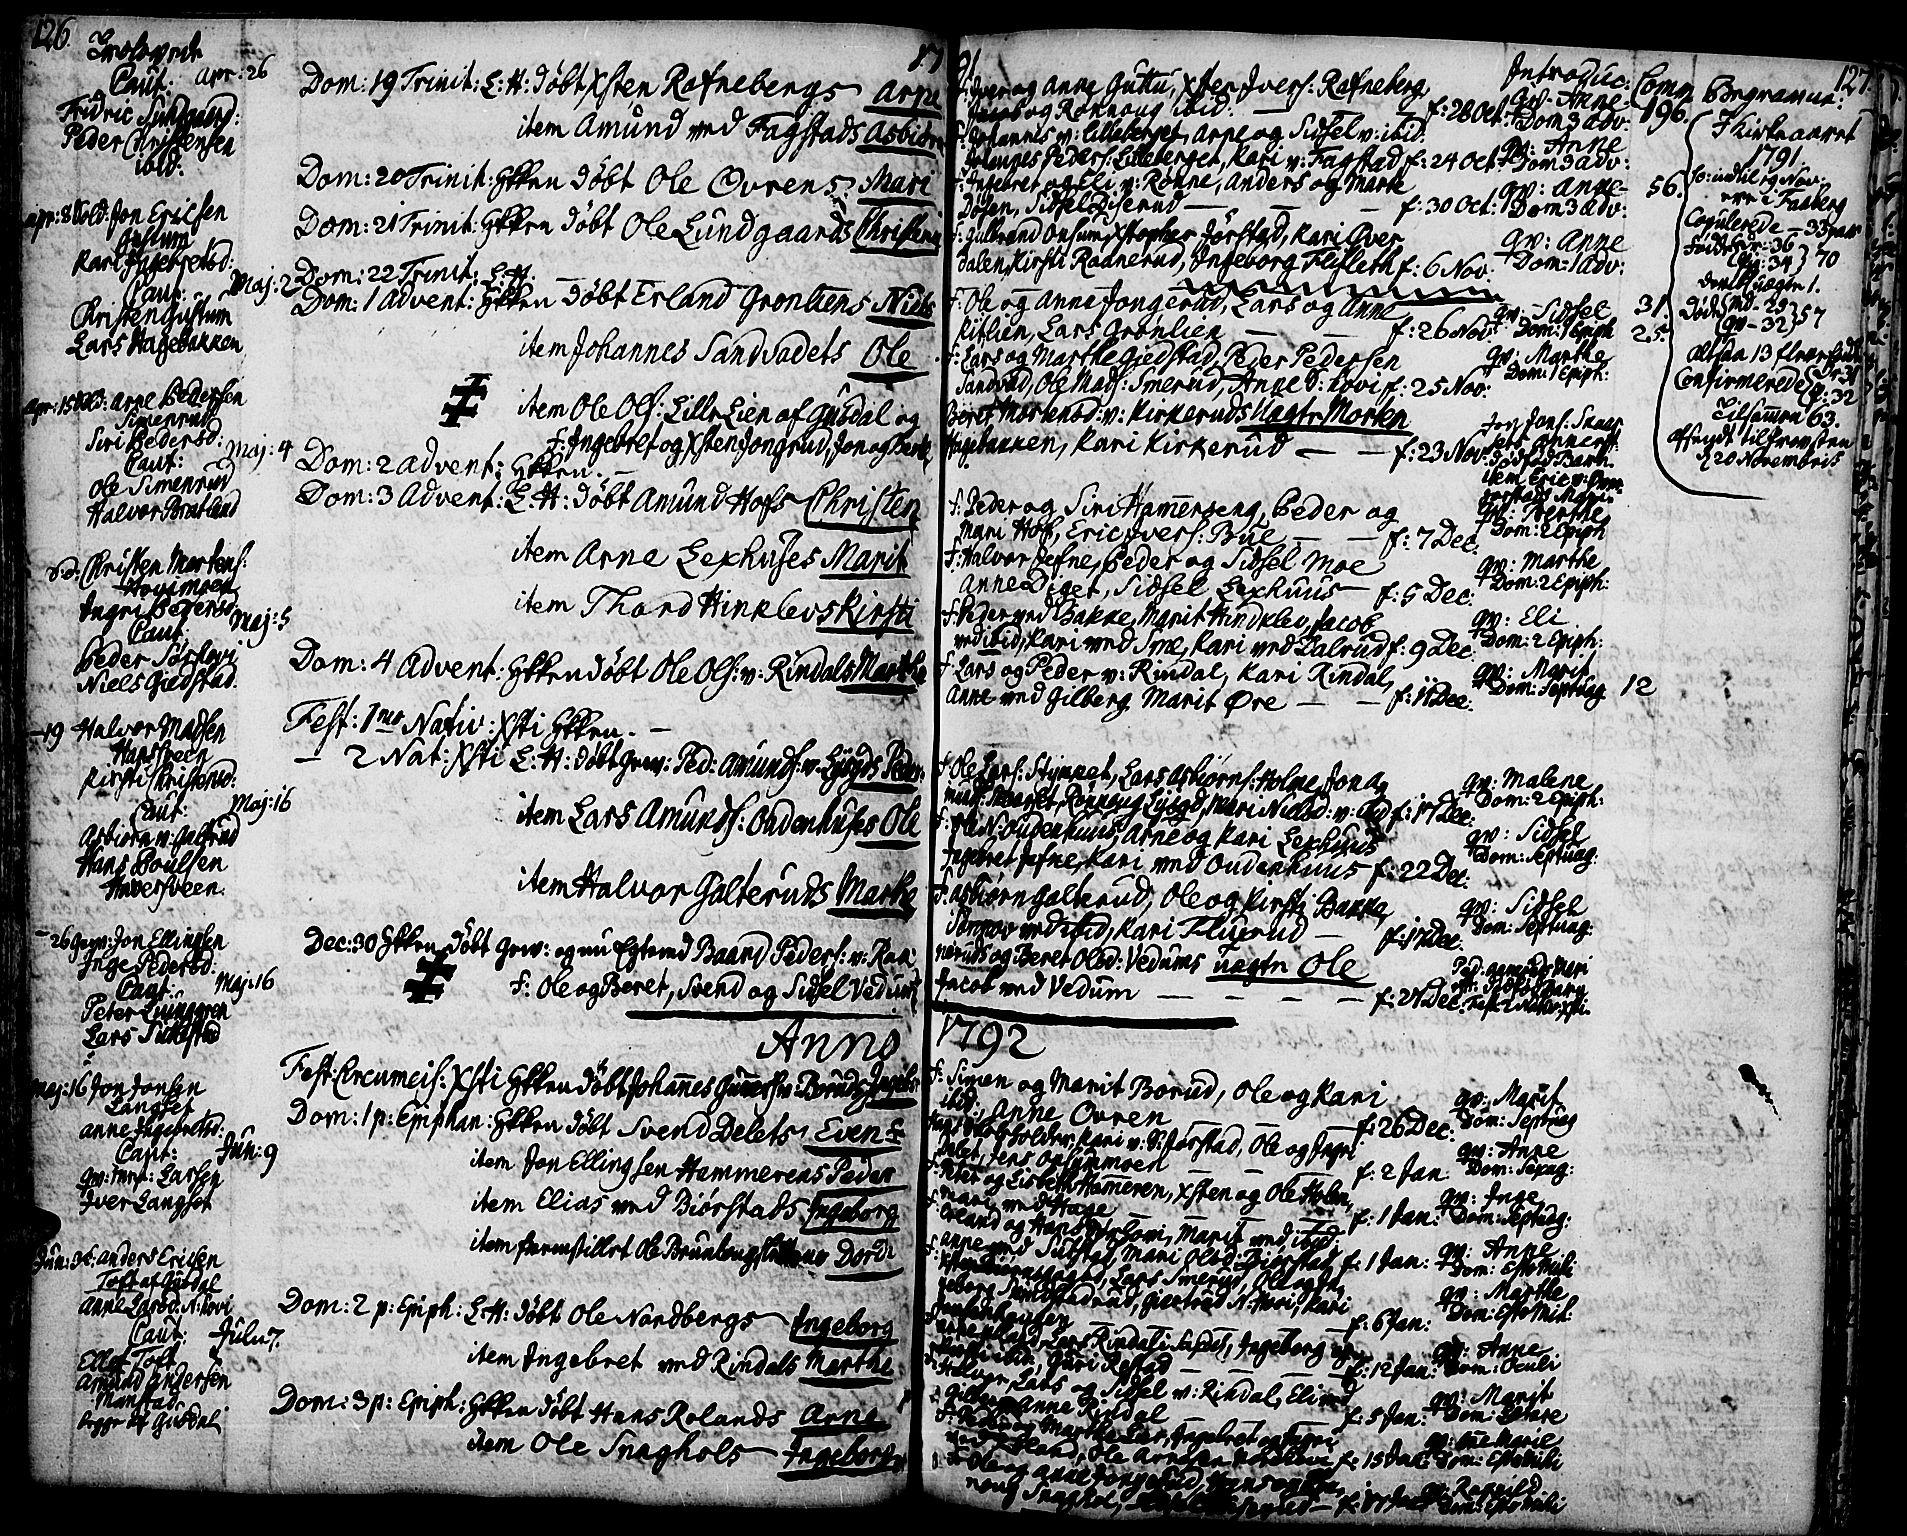 SAH, Fåberg prestekontor, Ministerialbok nr. 2, 1775-1818, s. 126-127